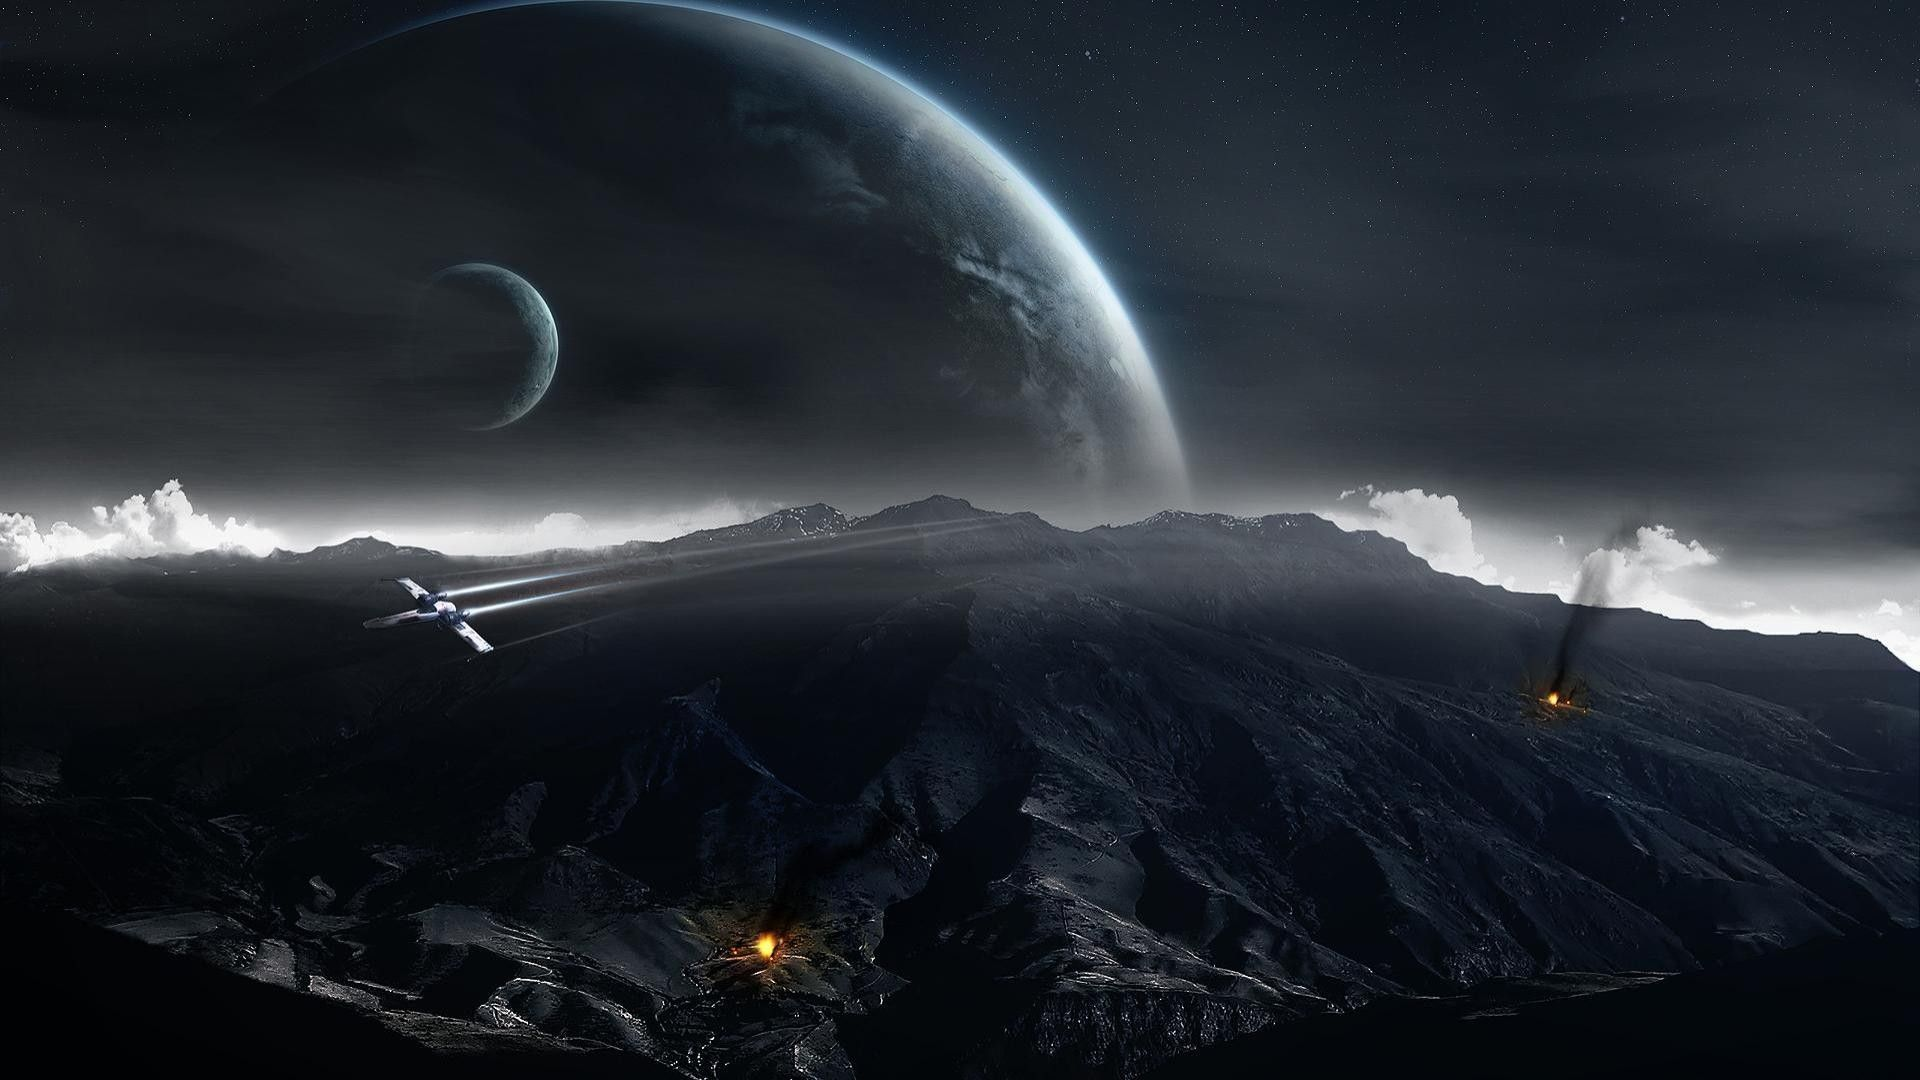 Star Wars Space Wallpaper Sf Wallpaper